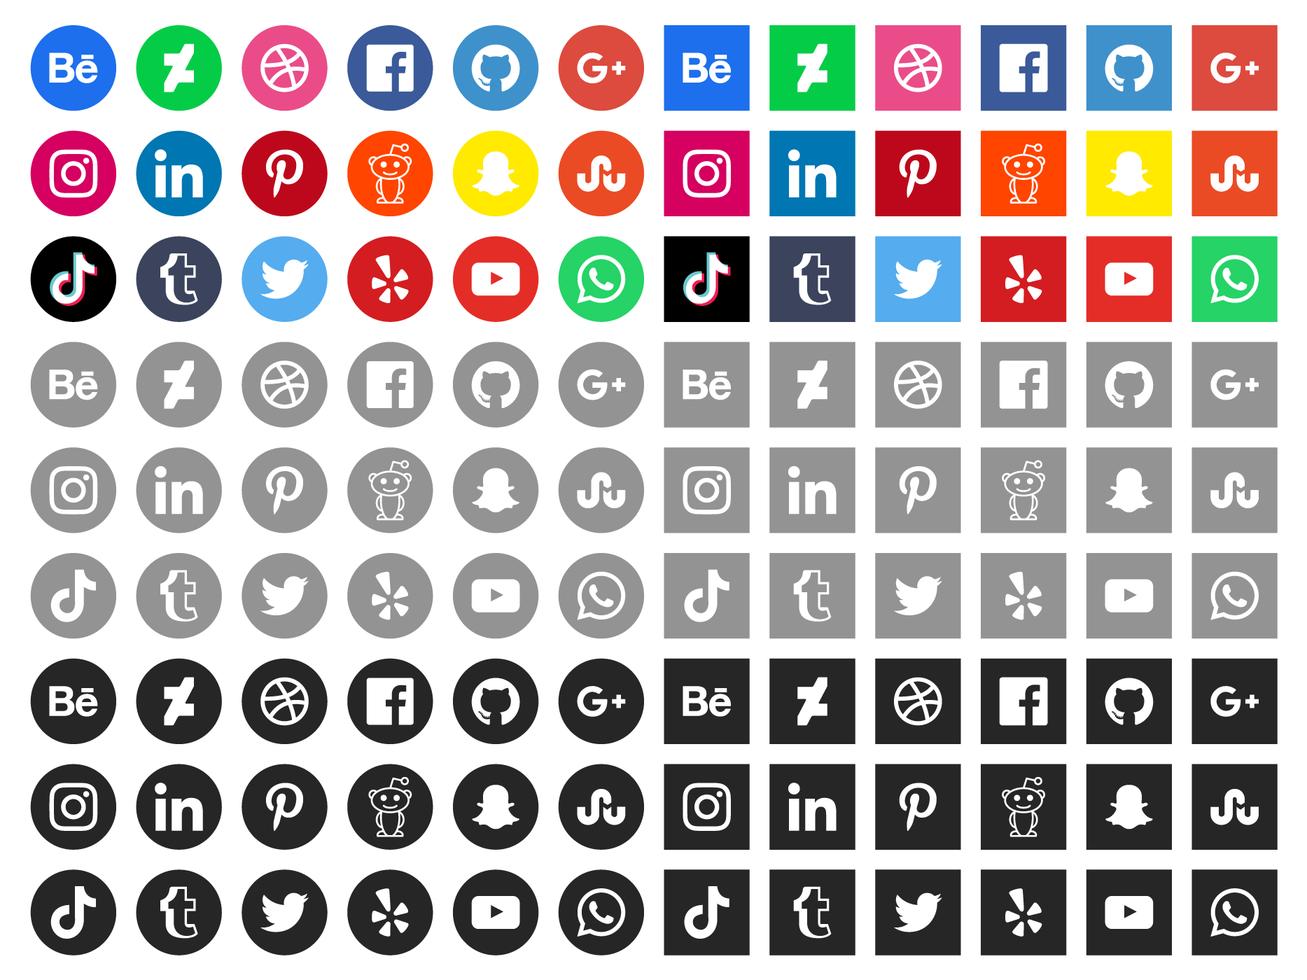 Gratis Social Media Pictogrammen vector